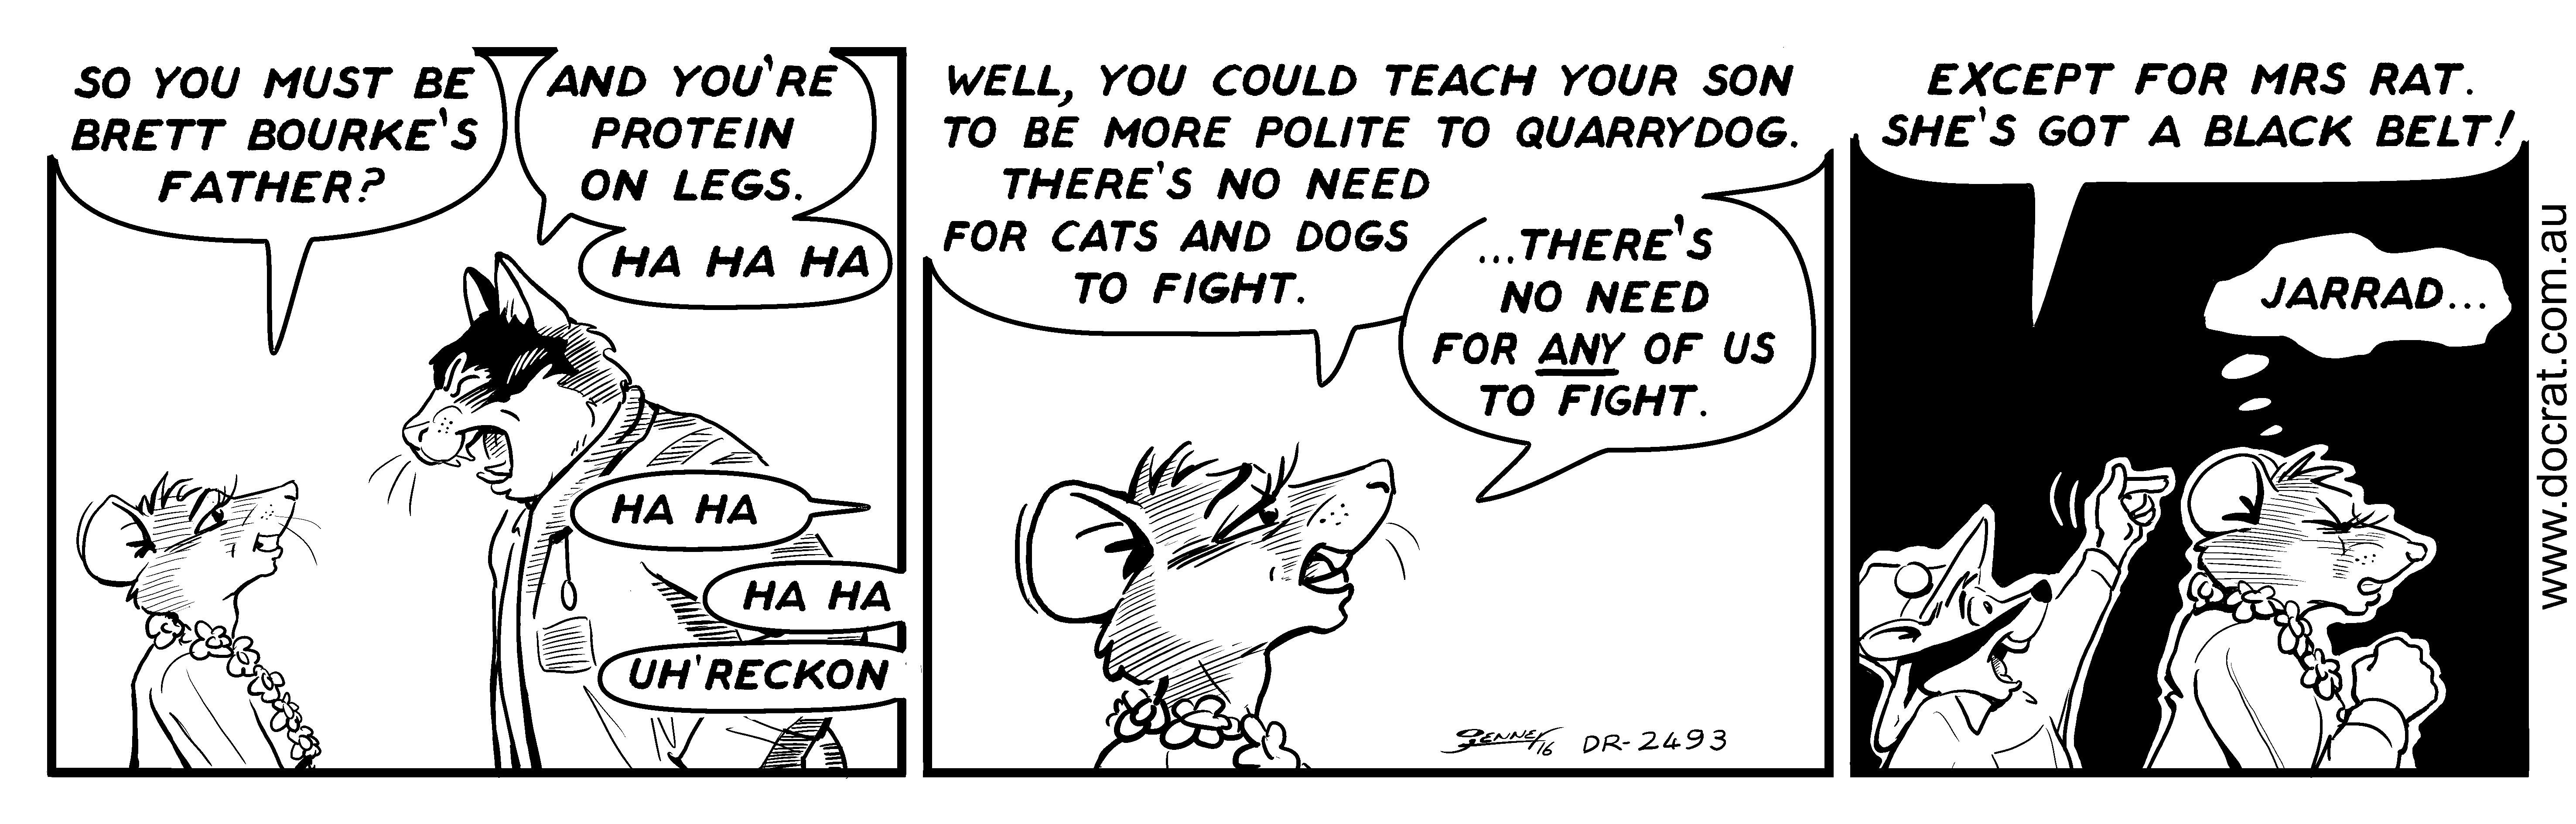 20160330